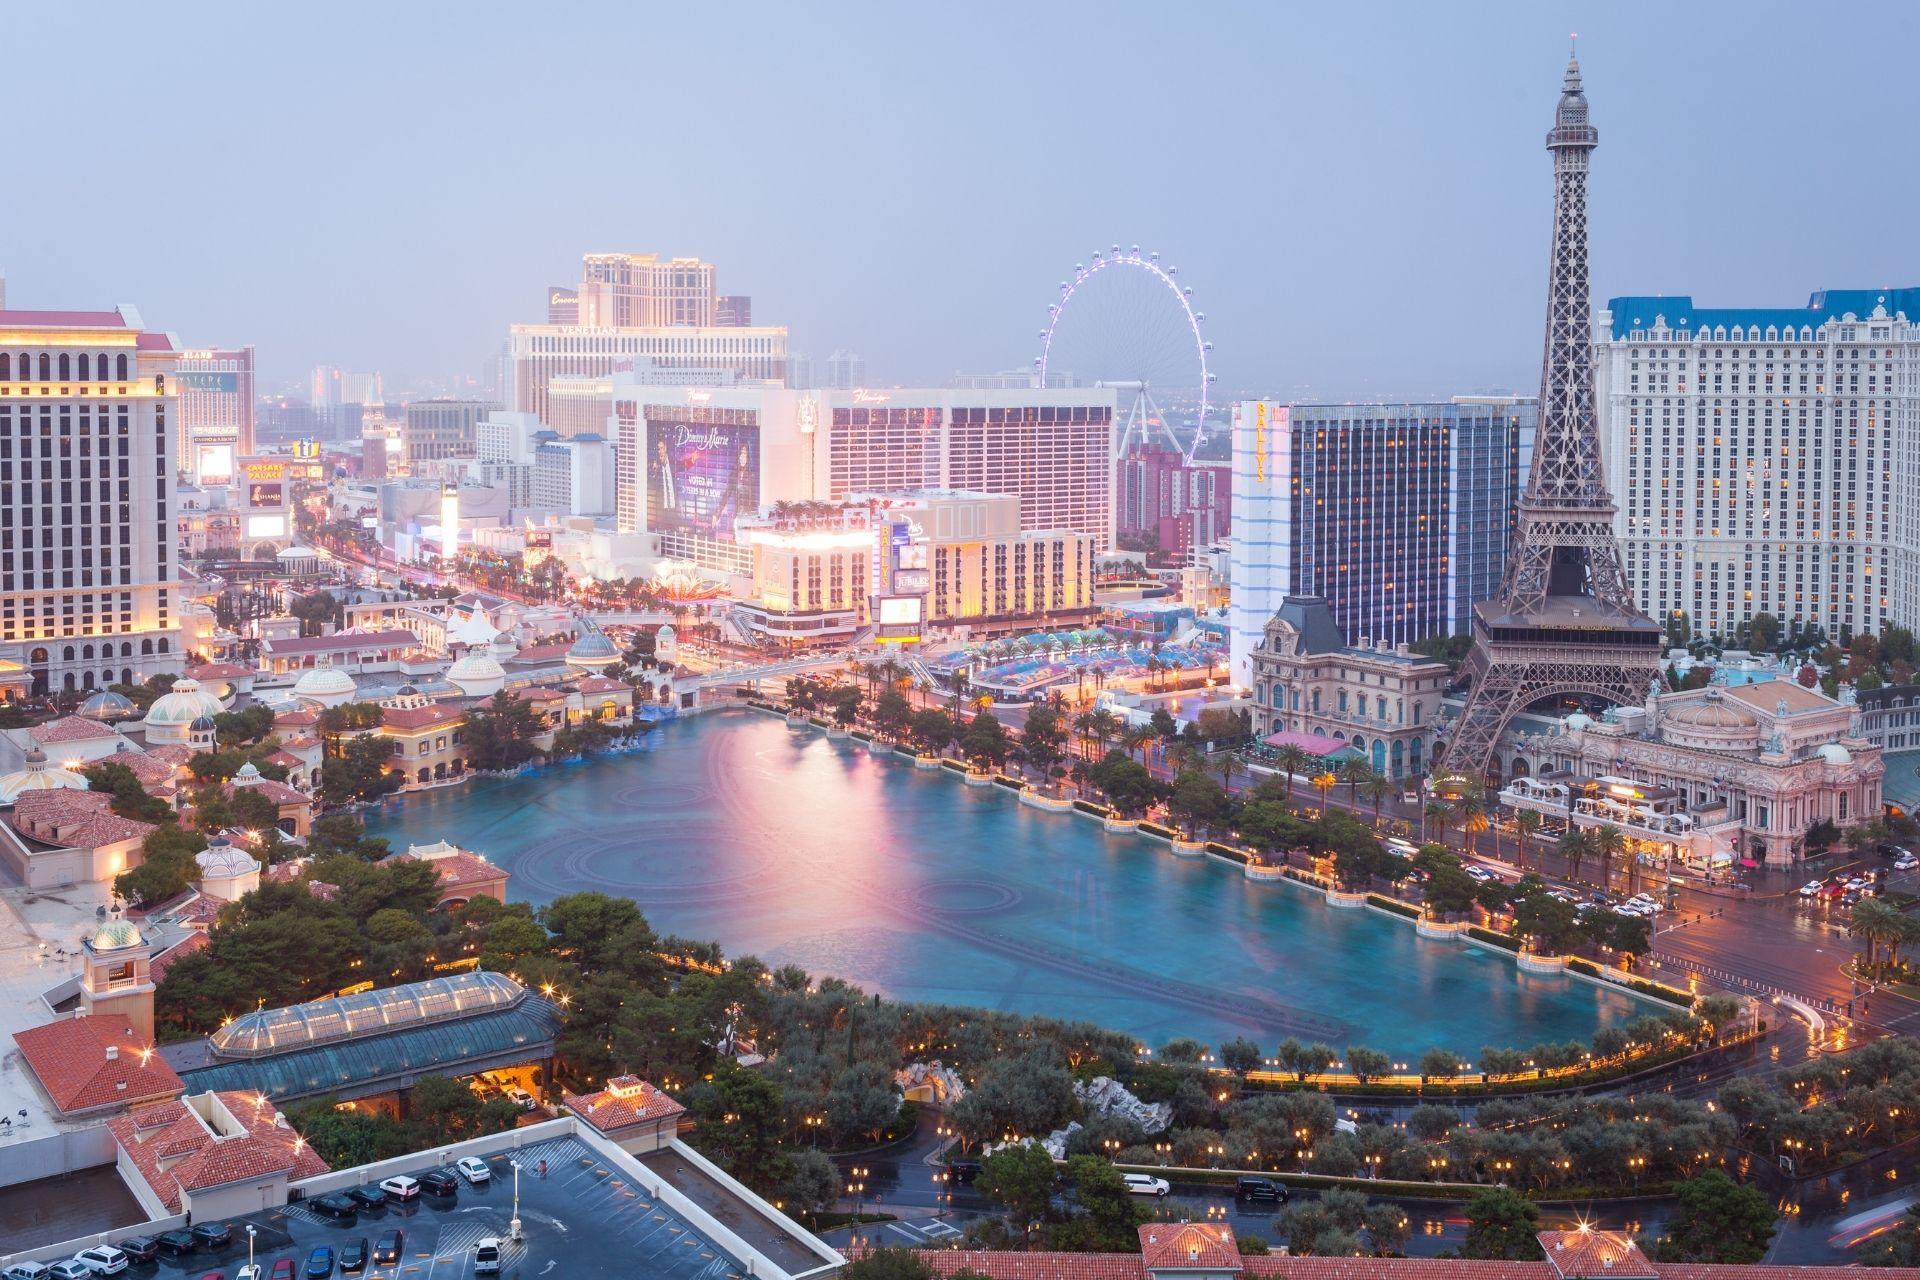 A view of Las Vegas at daytime